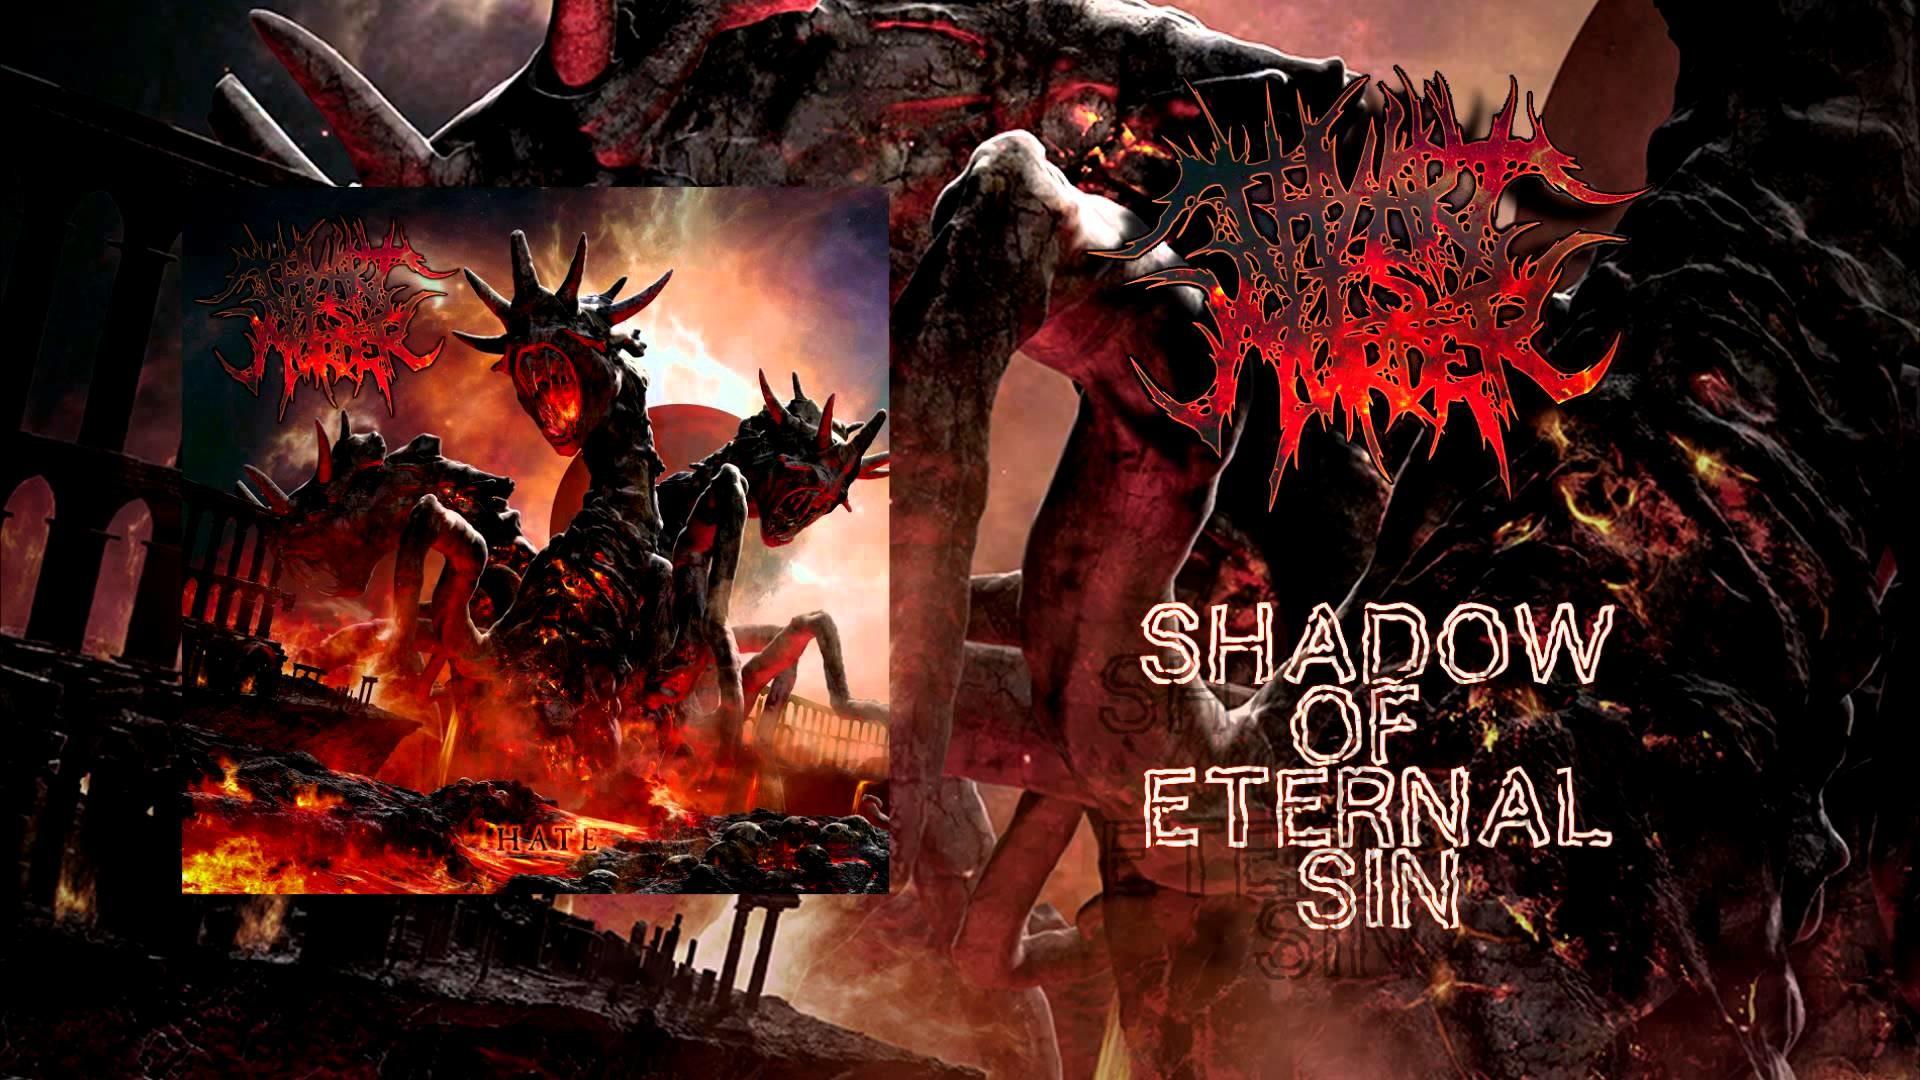 death metal Wallpapers